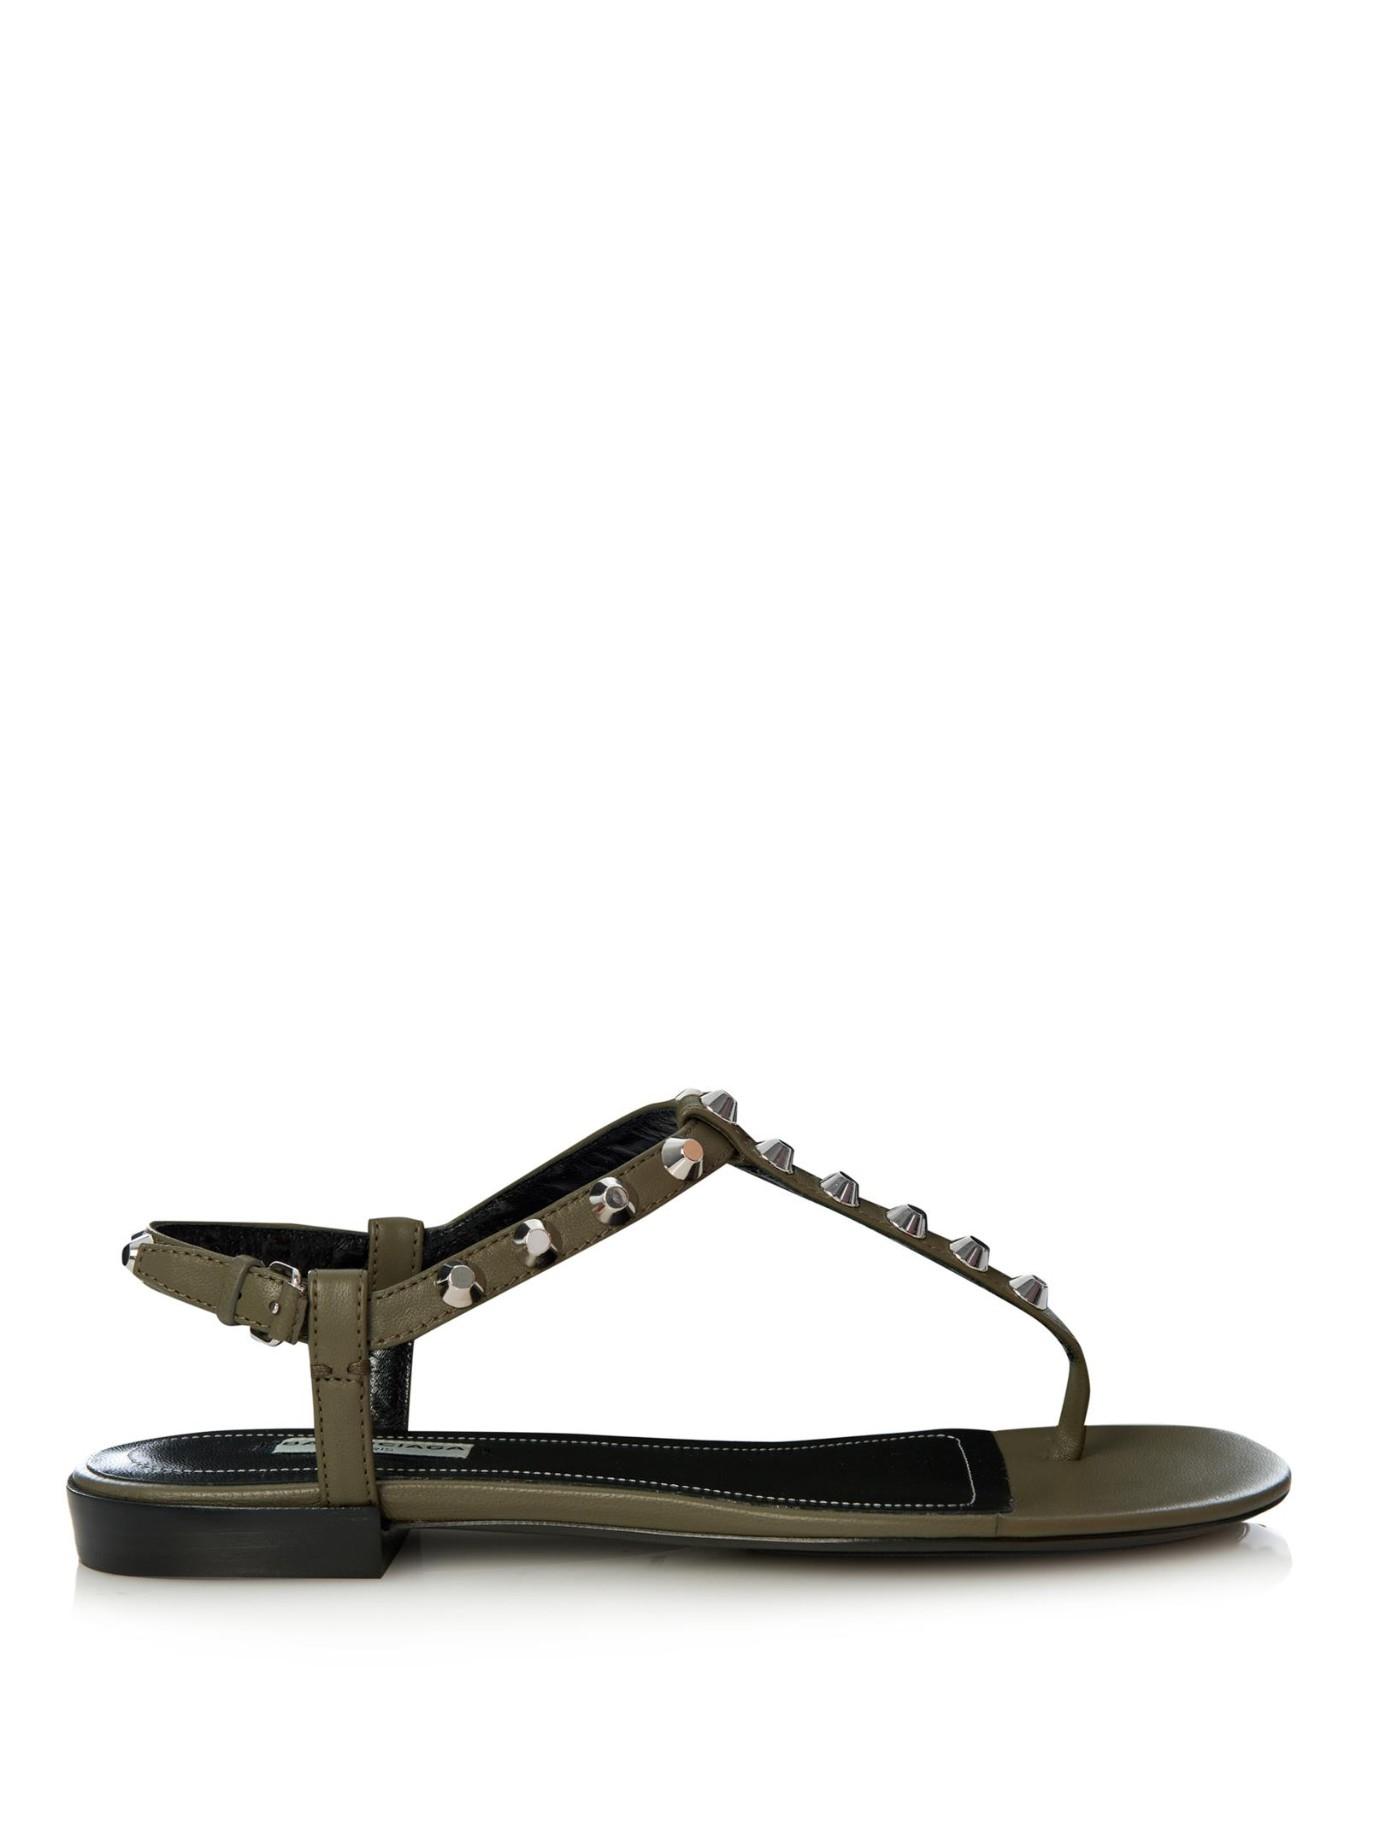 Balenciaga Arena Studded Flat Sandals In Khaki Natural